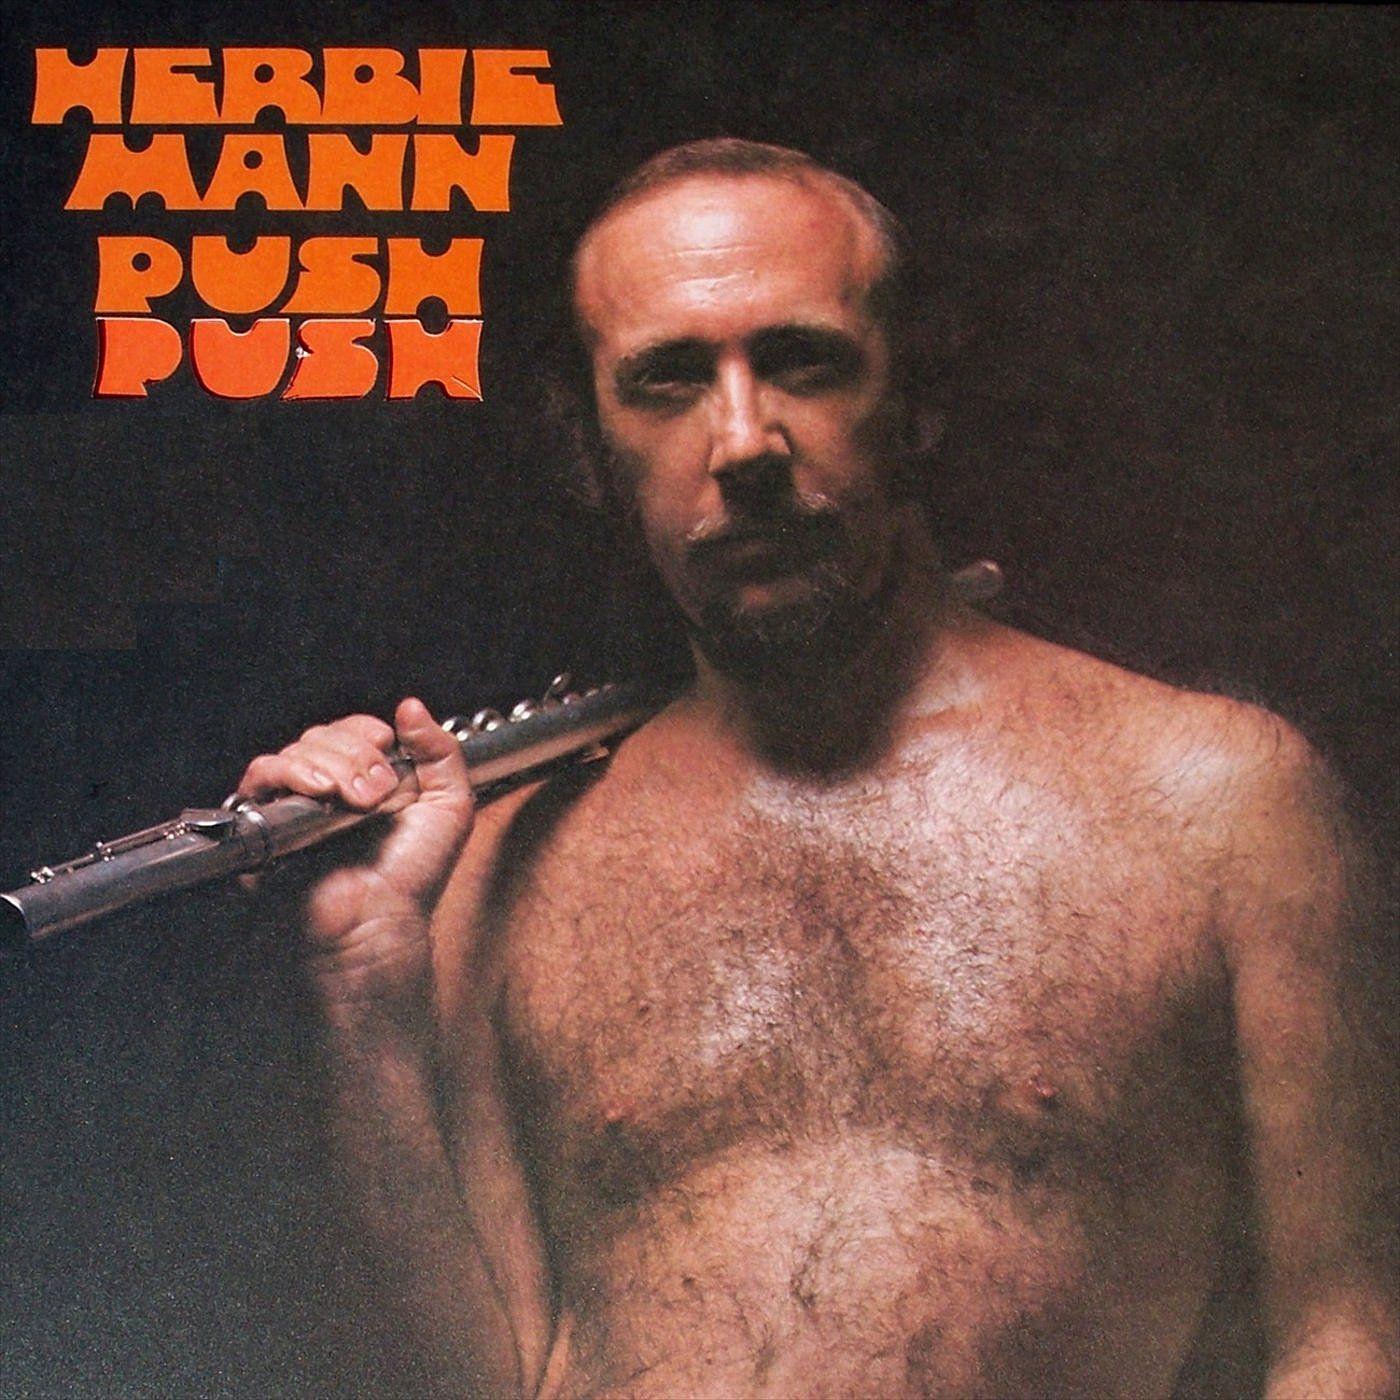 Album artwork for 'Push Push' by Herbie Mann